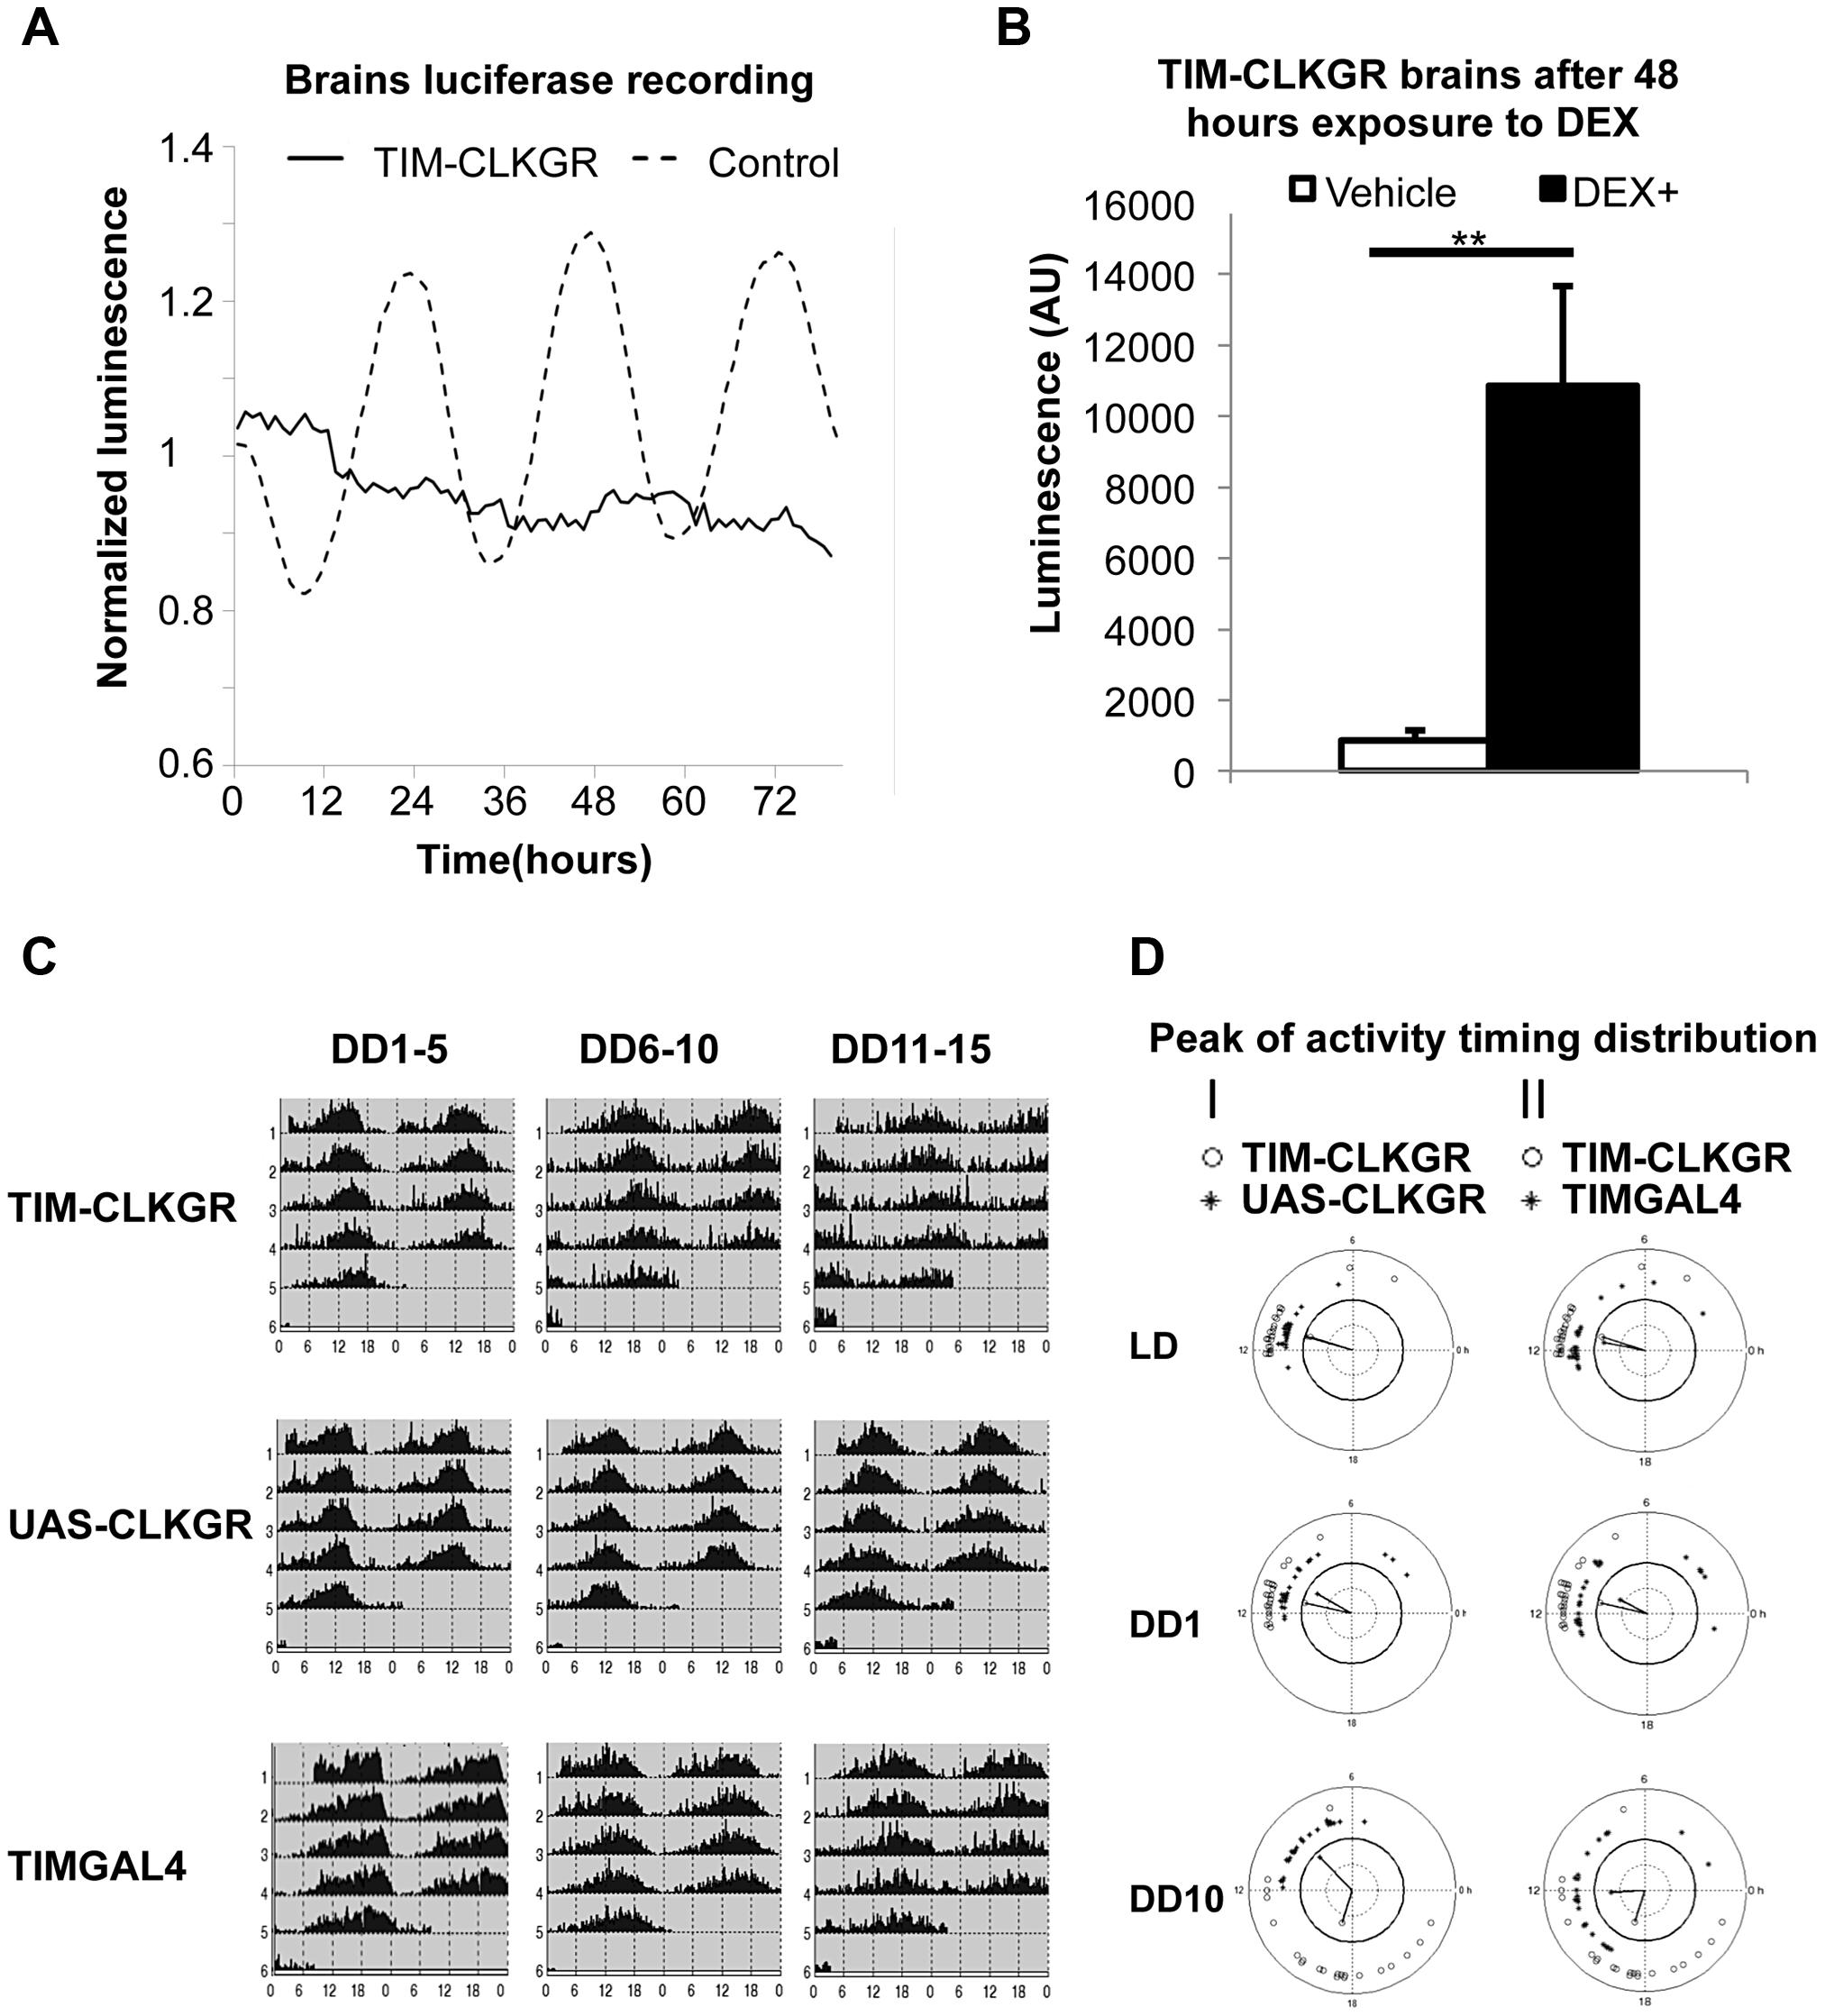 TIM-CLKGR flies display quasi-normal locomotor activity rhythms despite impaired transcriptional oscillations in the brain.